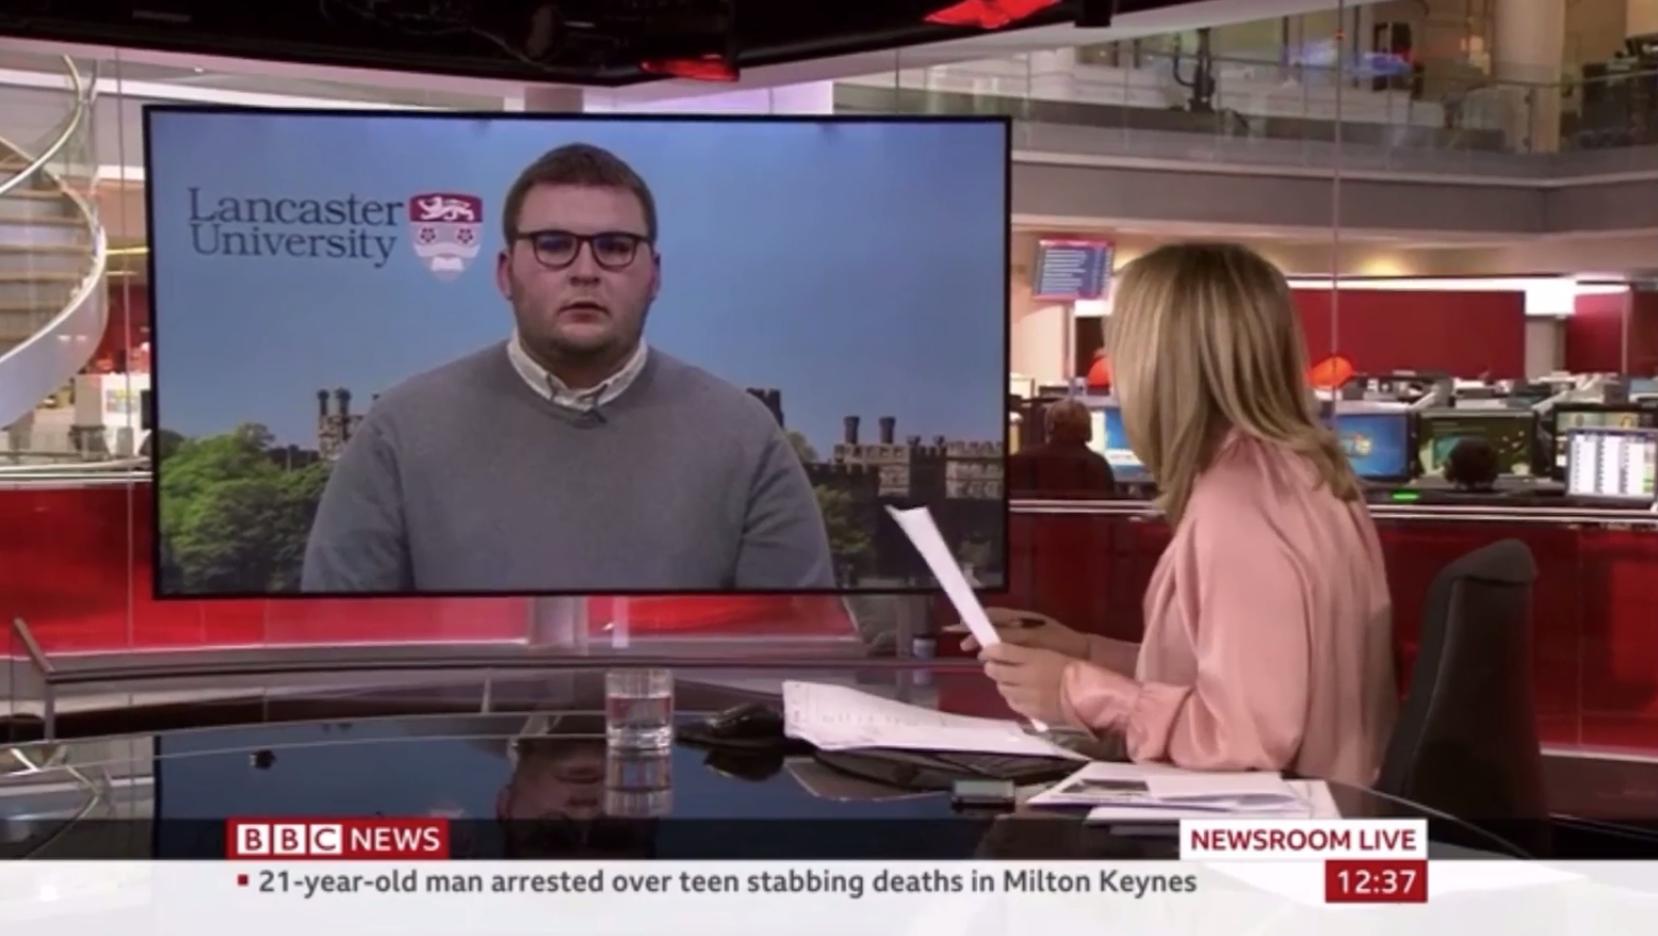 bbc_live_interview_191022